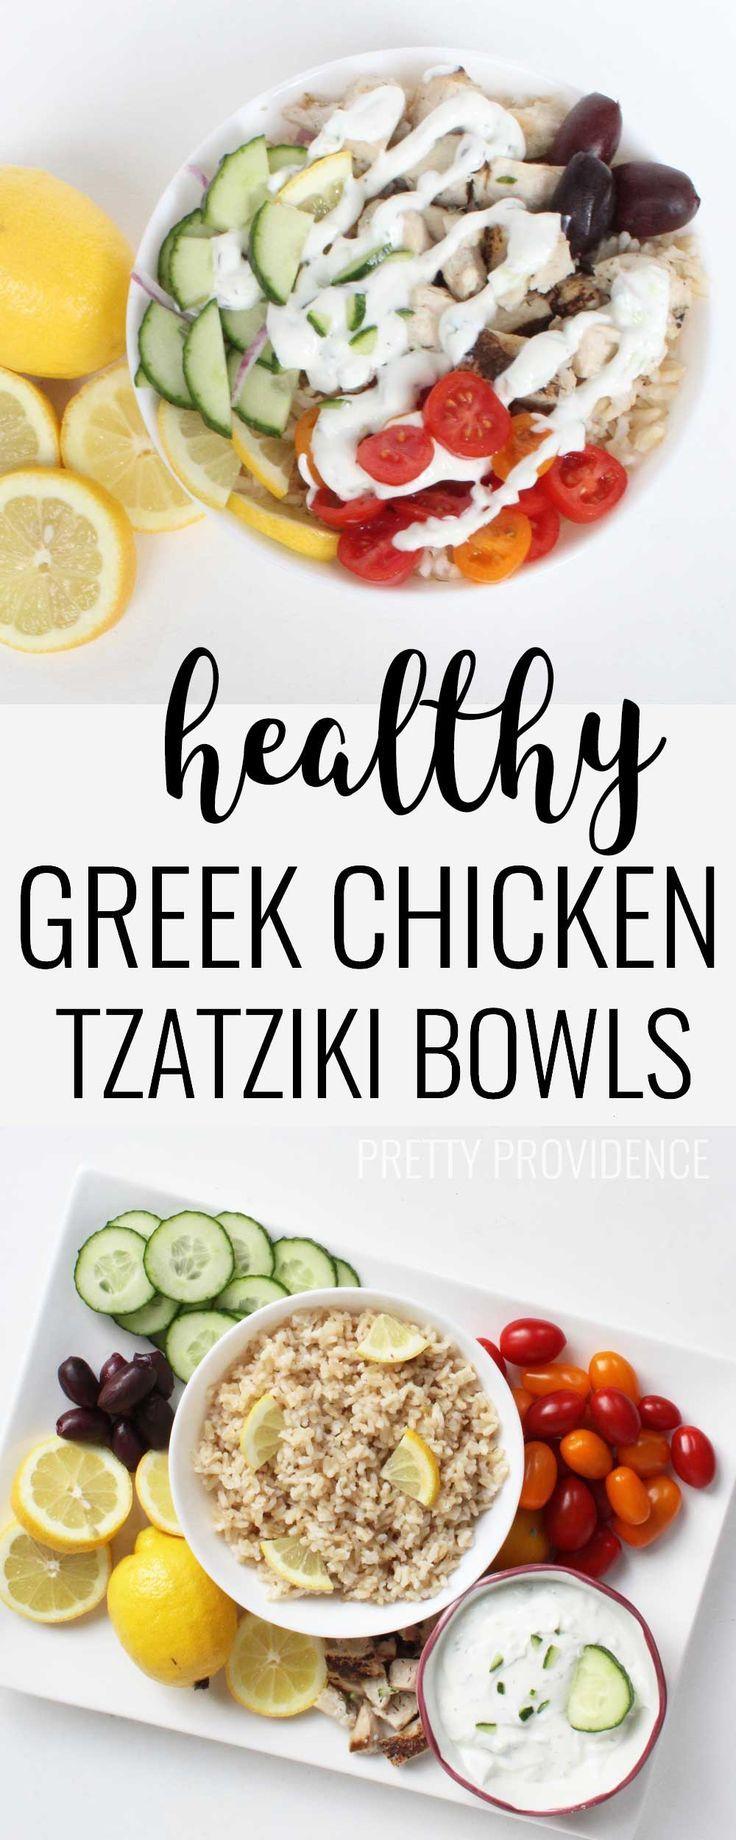 2310 best eat clean images on pinterest - Healthy greek recipes for dinner mediterranean savour ...